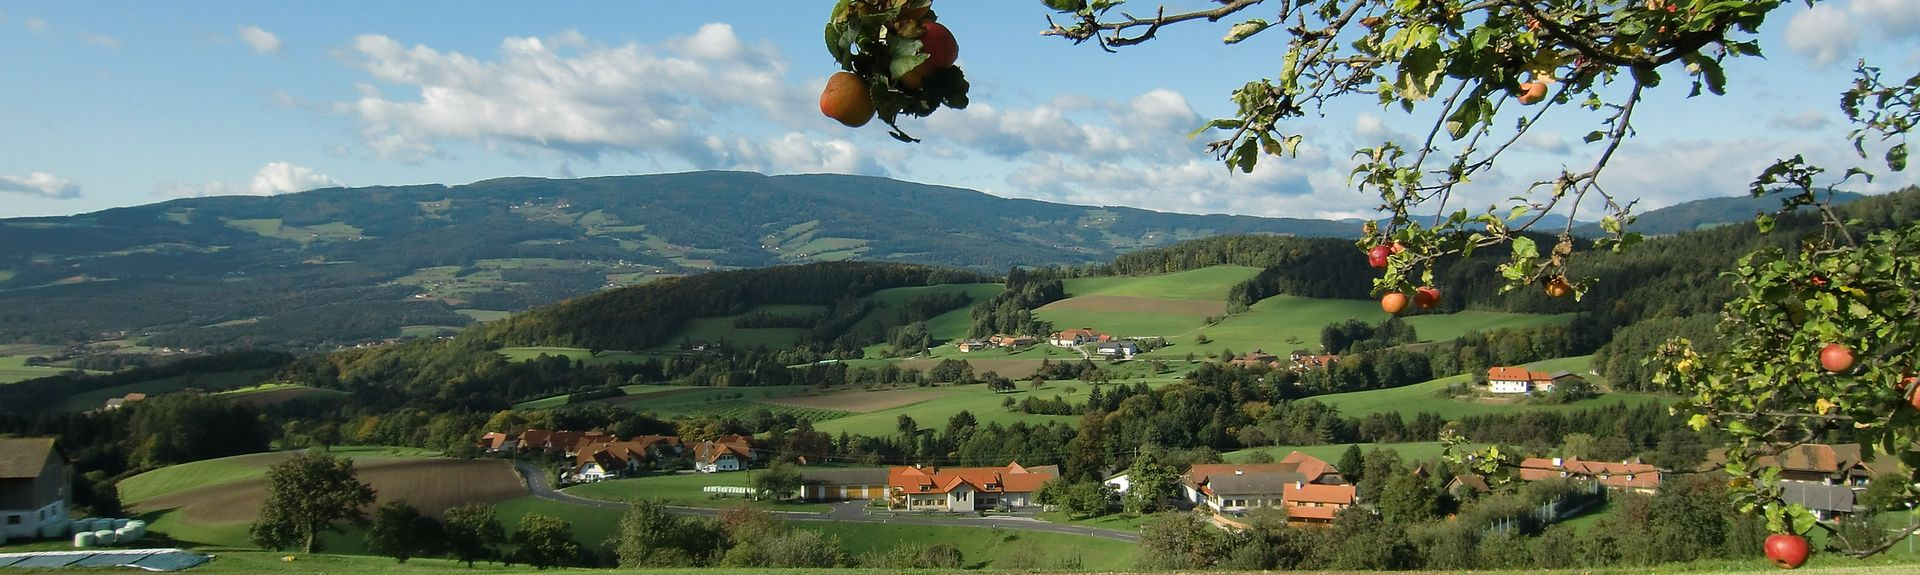 Pöllauberg, Austria